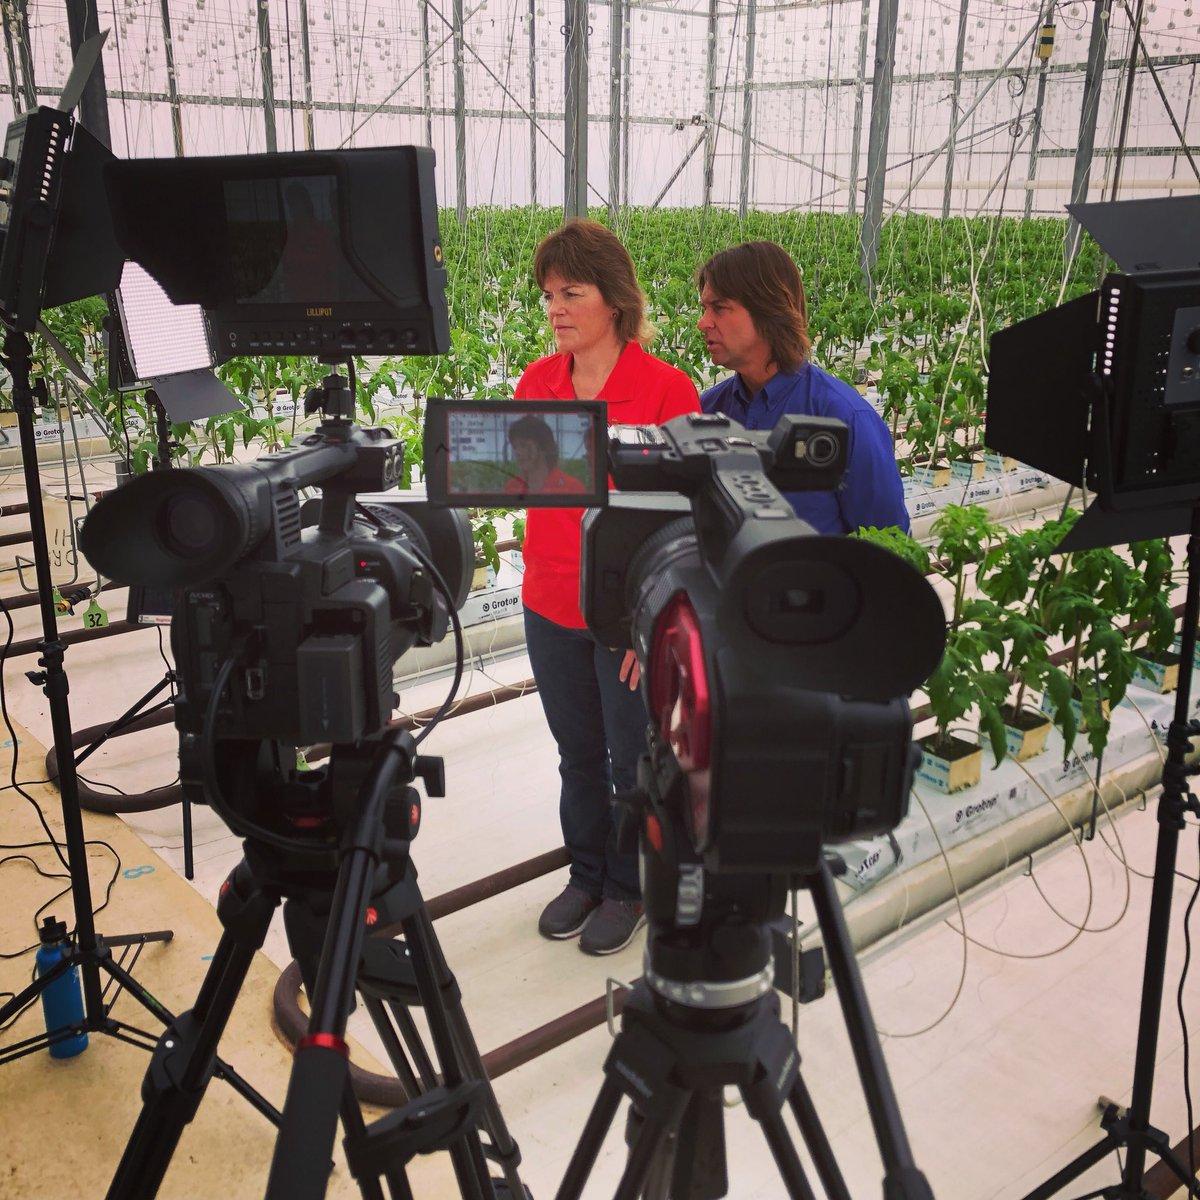 test Twitter Media - RT @A_SquaredComm: Had a great day filming @farmfreshnanton today! #video #videoproduction #asquaredtv #yycbiz https://t.co/O4rzmYWllJ